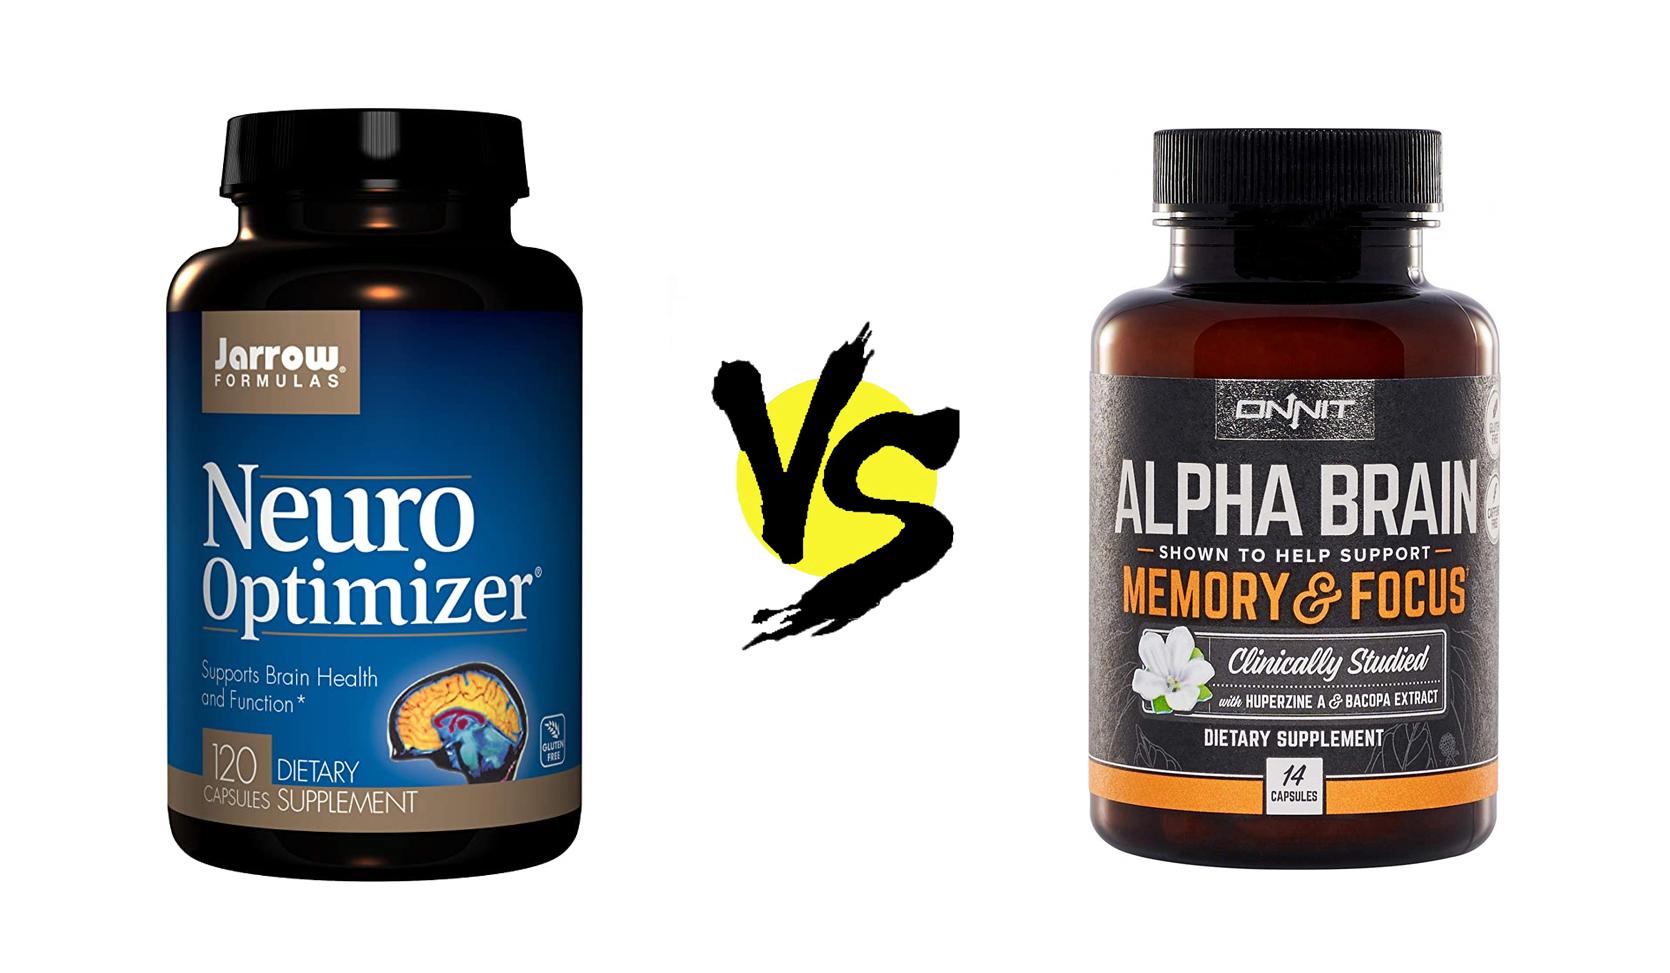 neuro optimizer vs. alpha brain review